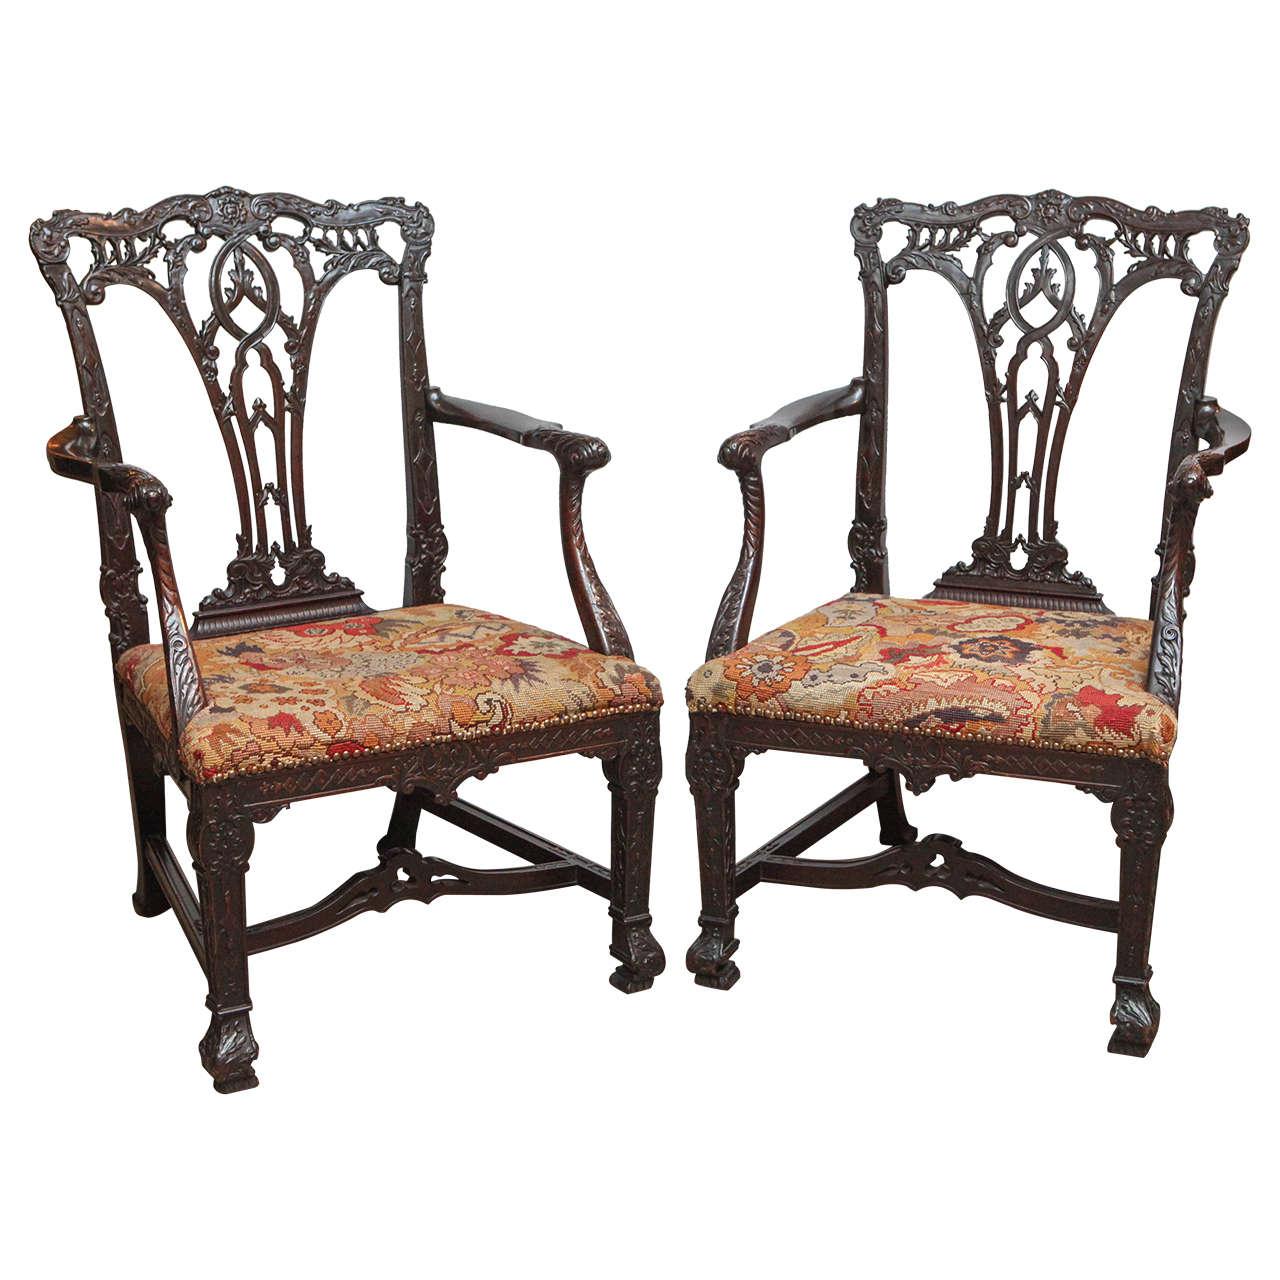 Pair of 19th Century English Mahogany Oversized Armchairs